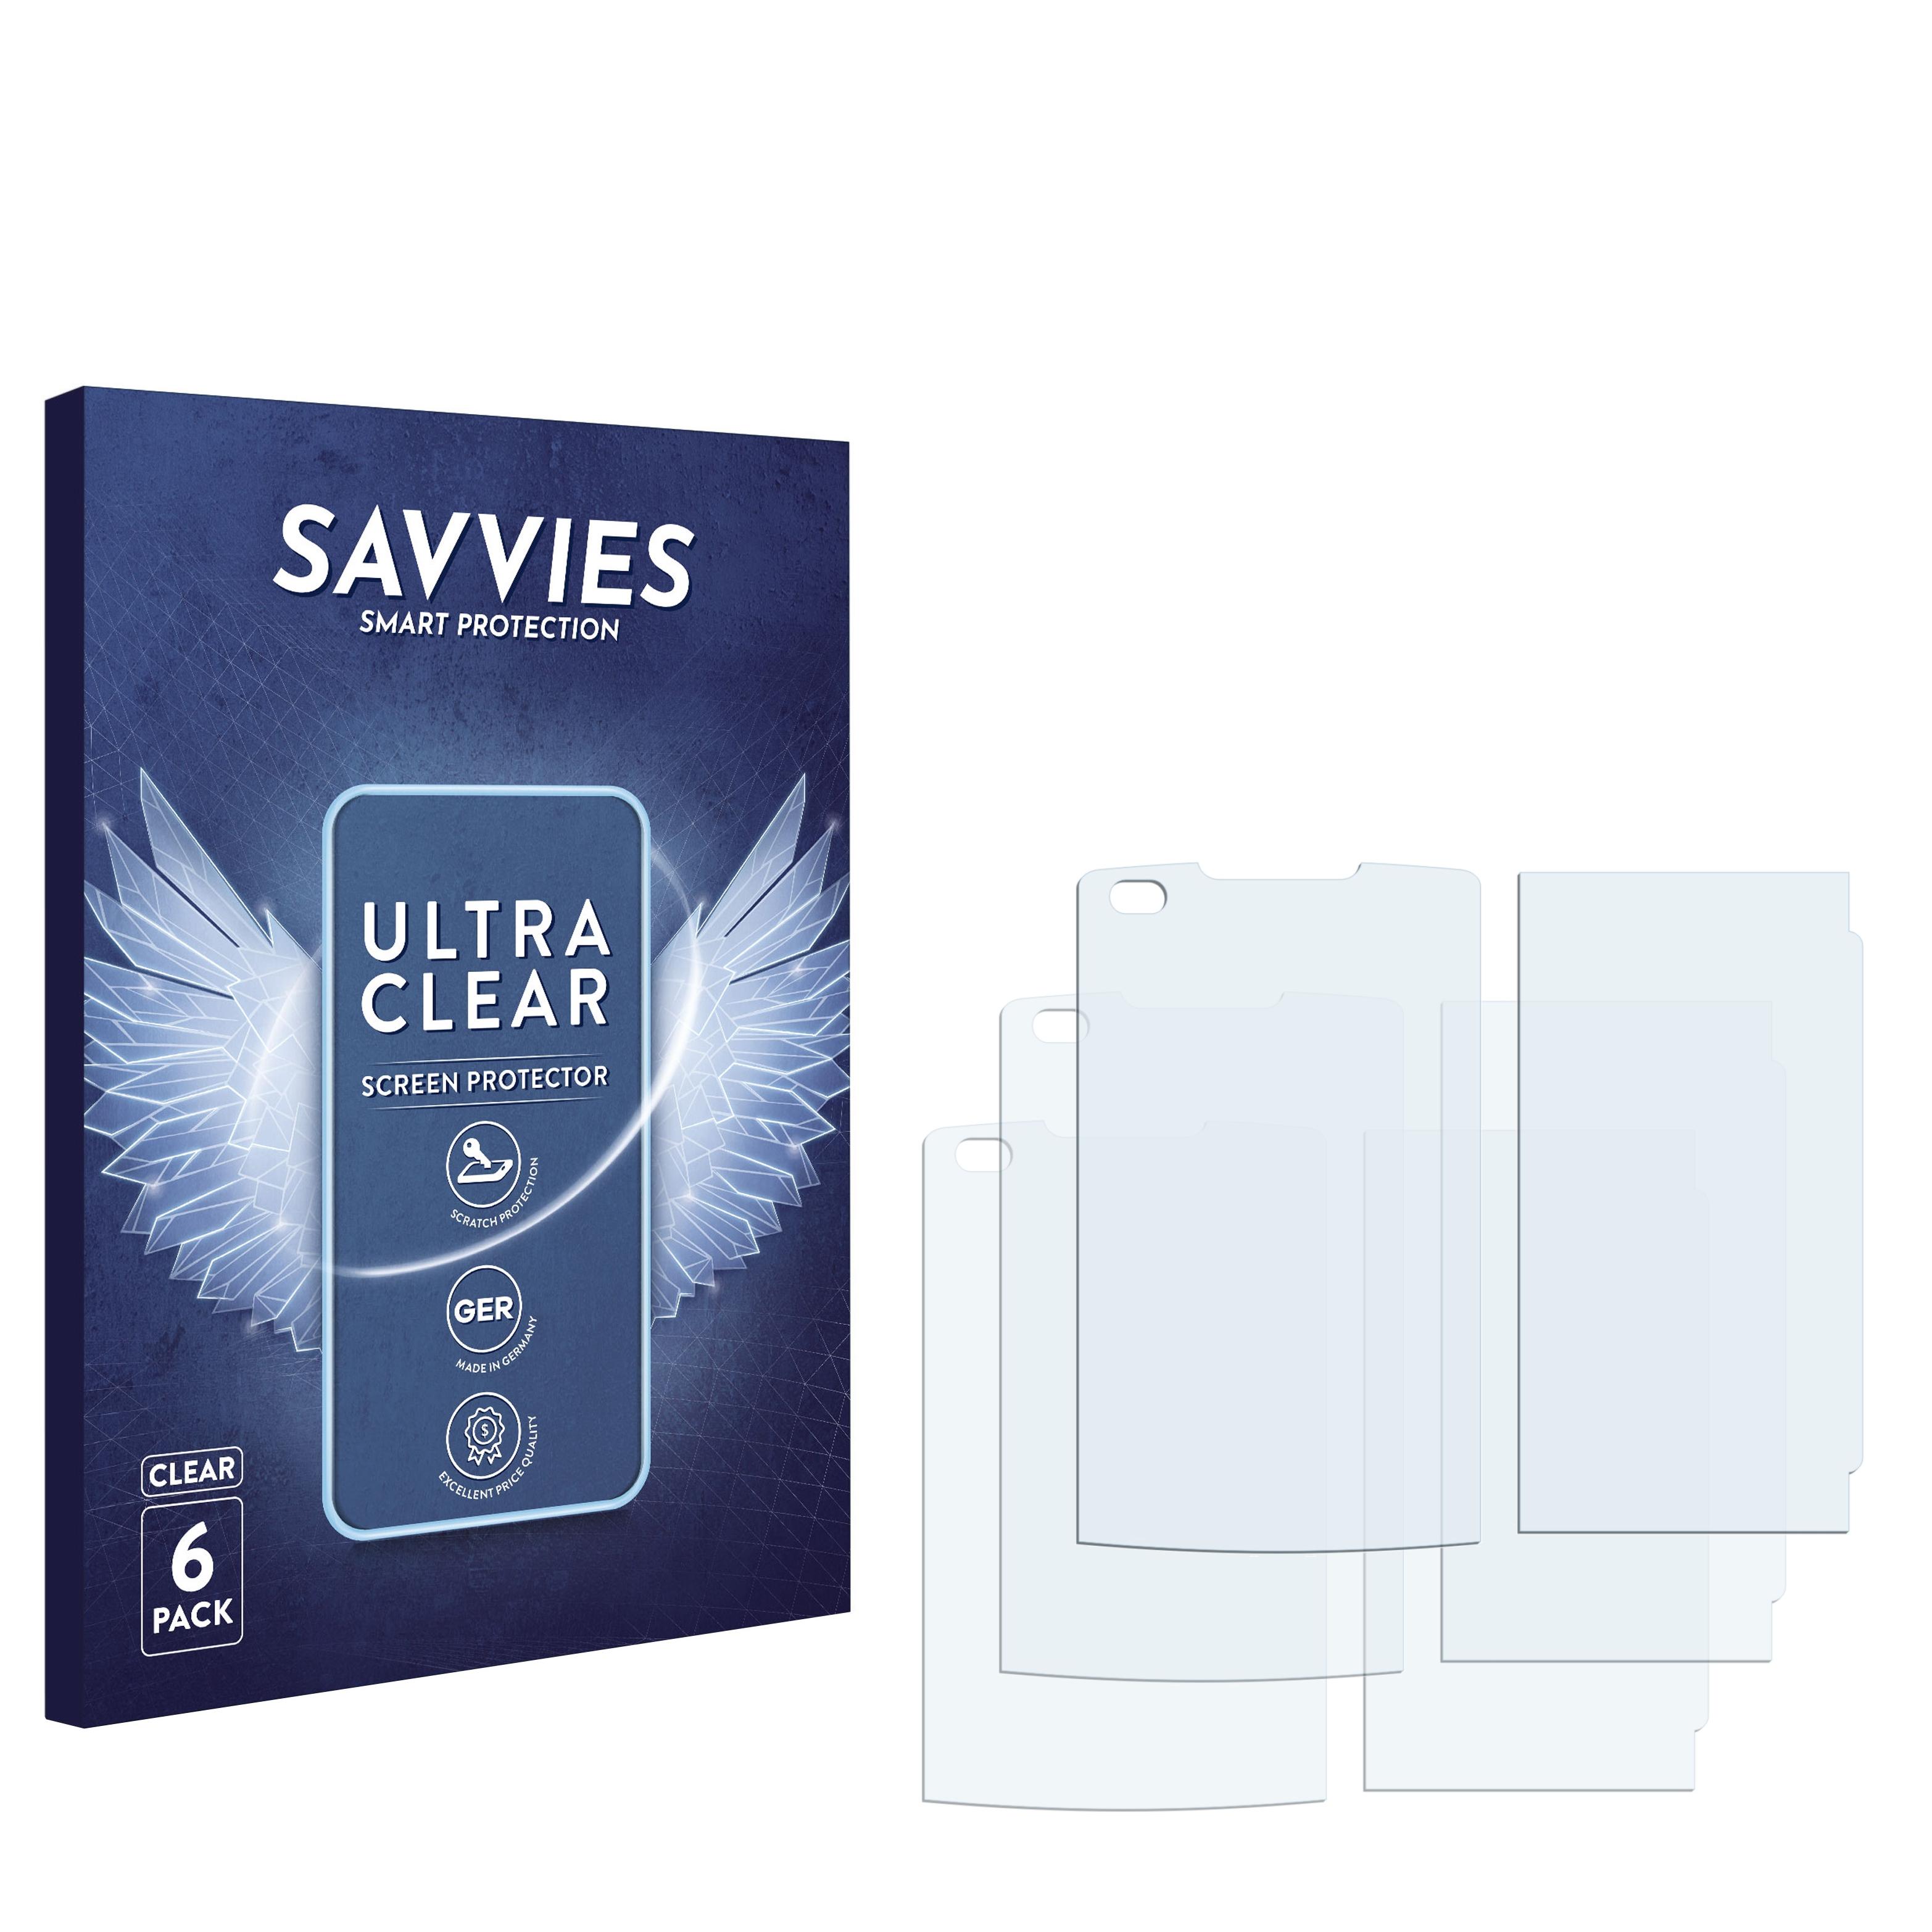 Ochranná fólie Savvies na LG Electronics VX-11000 enV Touch, 6ks